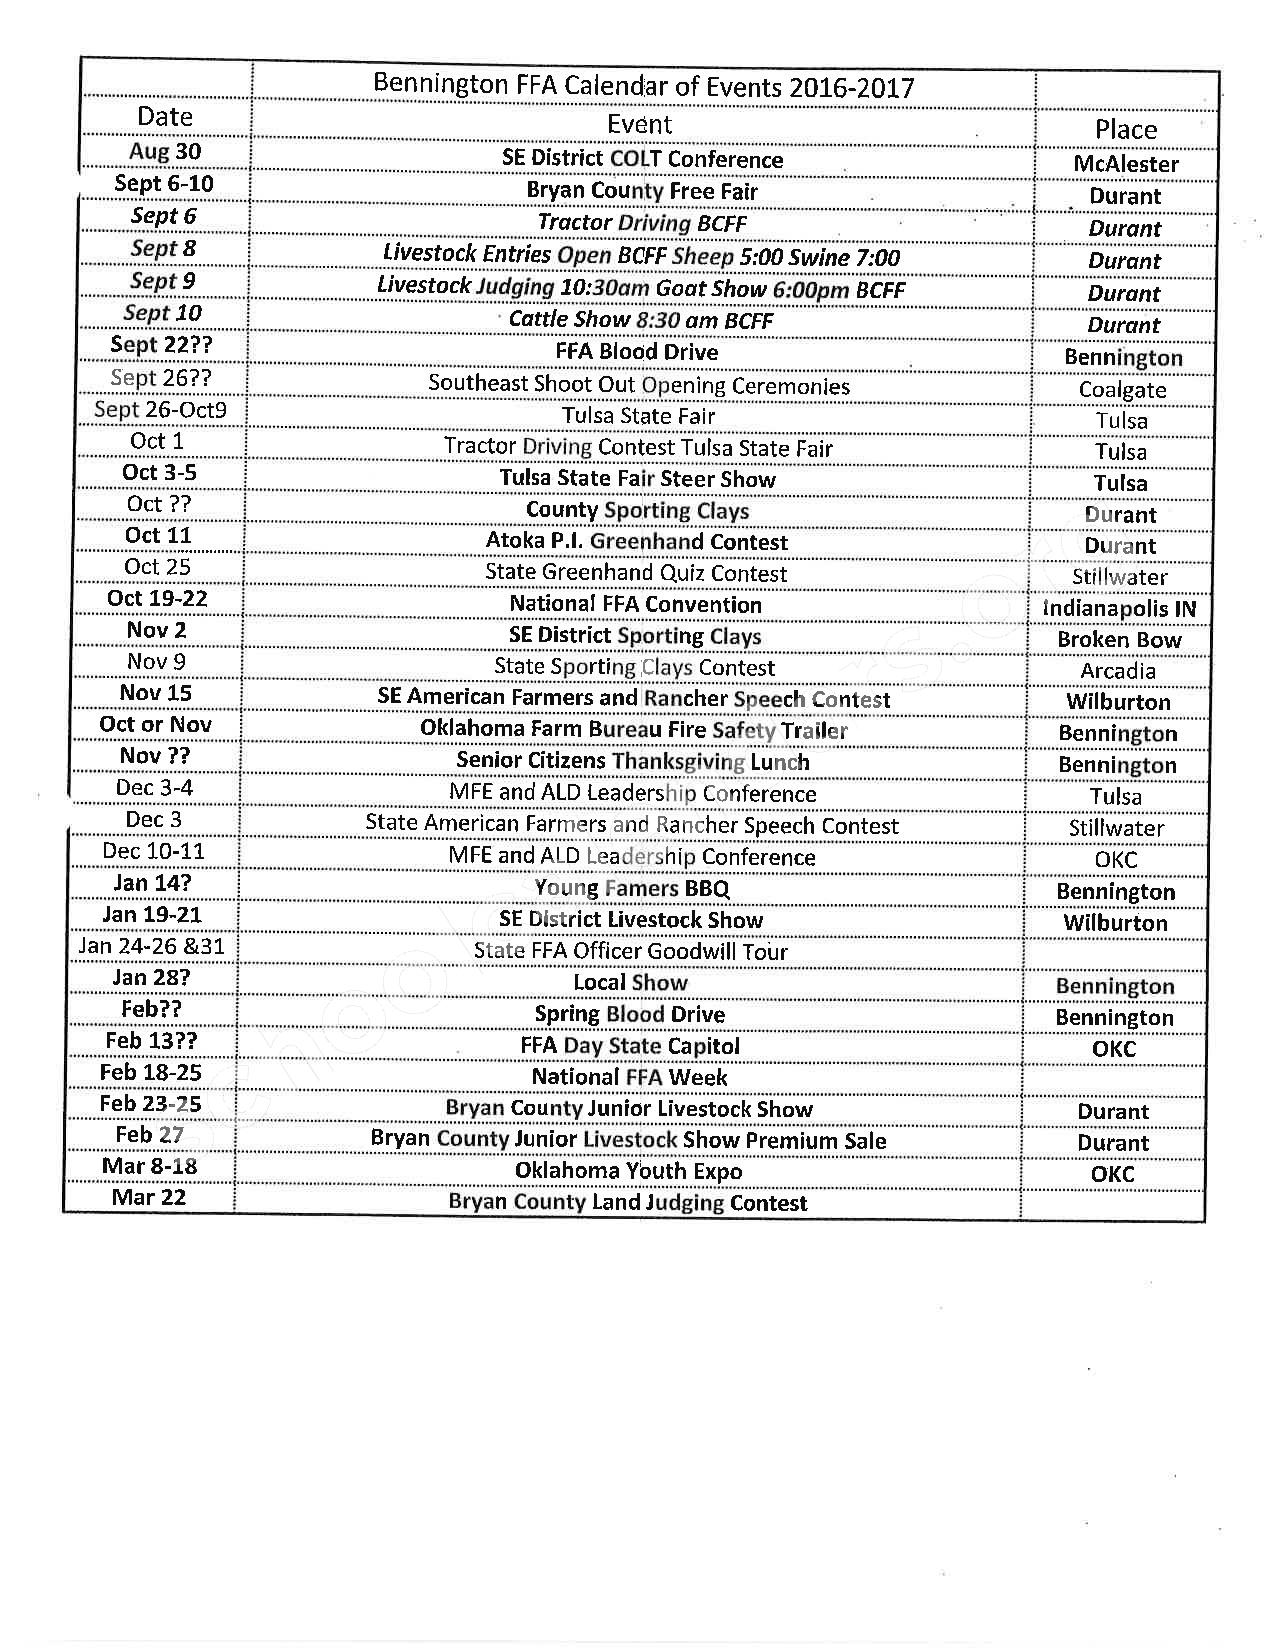 2016 - 2017 School Calendar – Bennington Elementary School – page 1